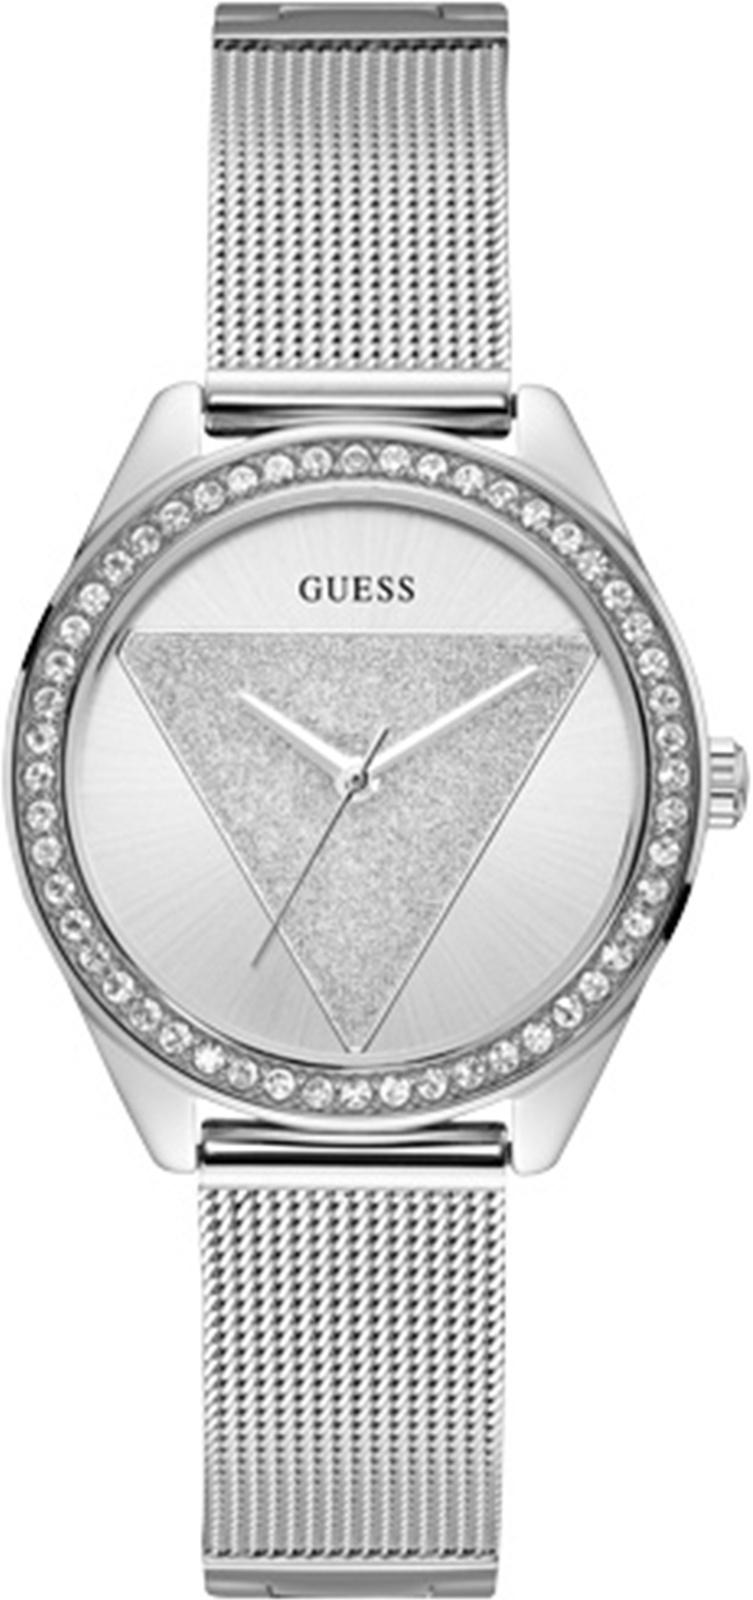 Часы Guess TRI GLITZ, серебристый цена и фото